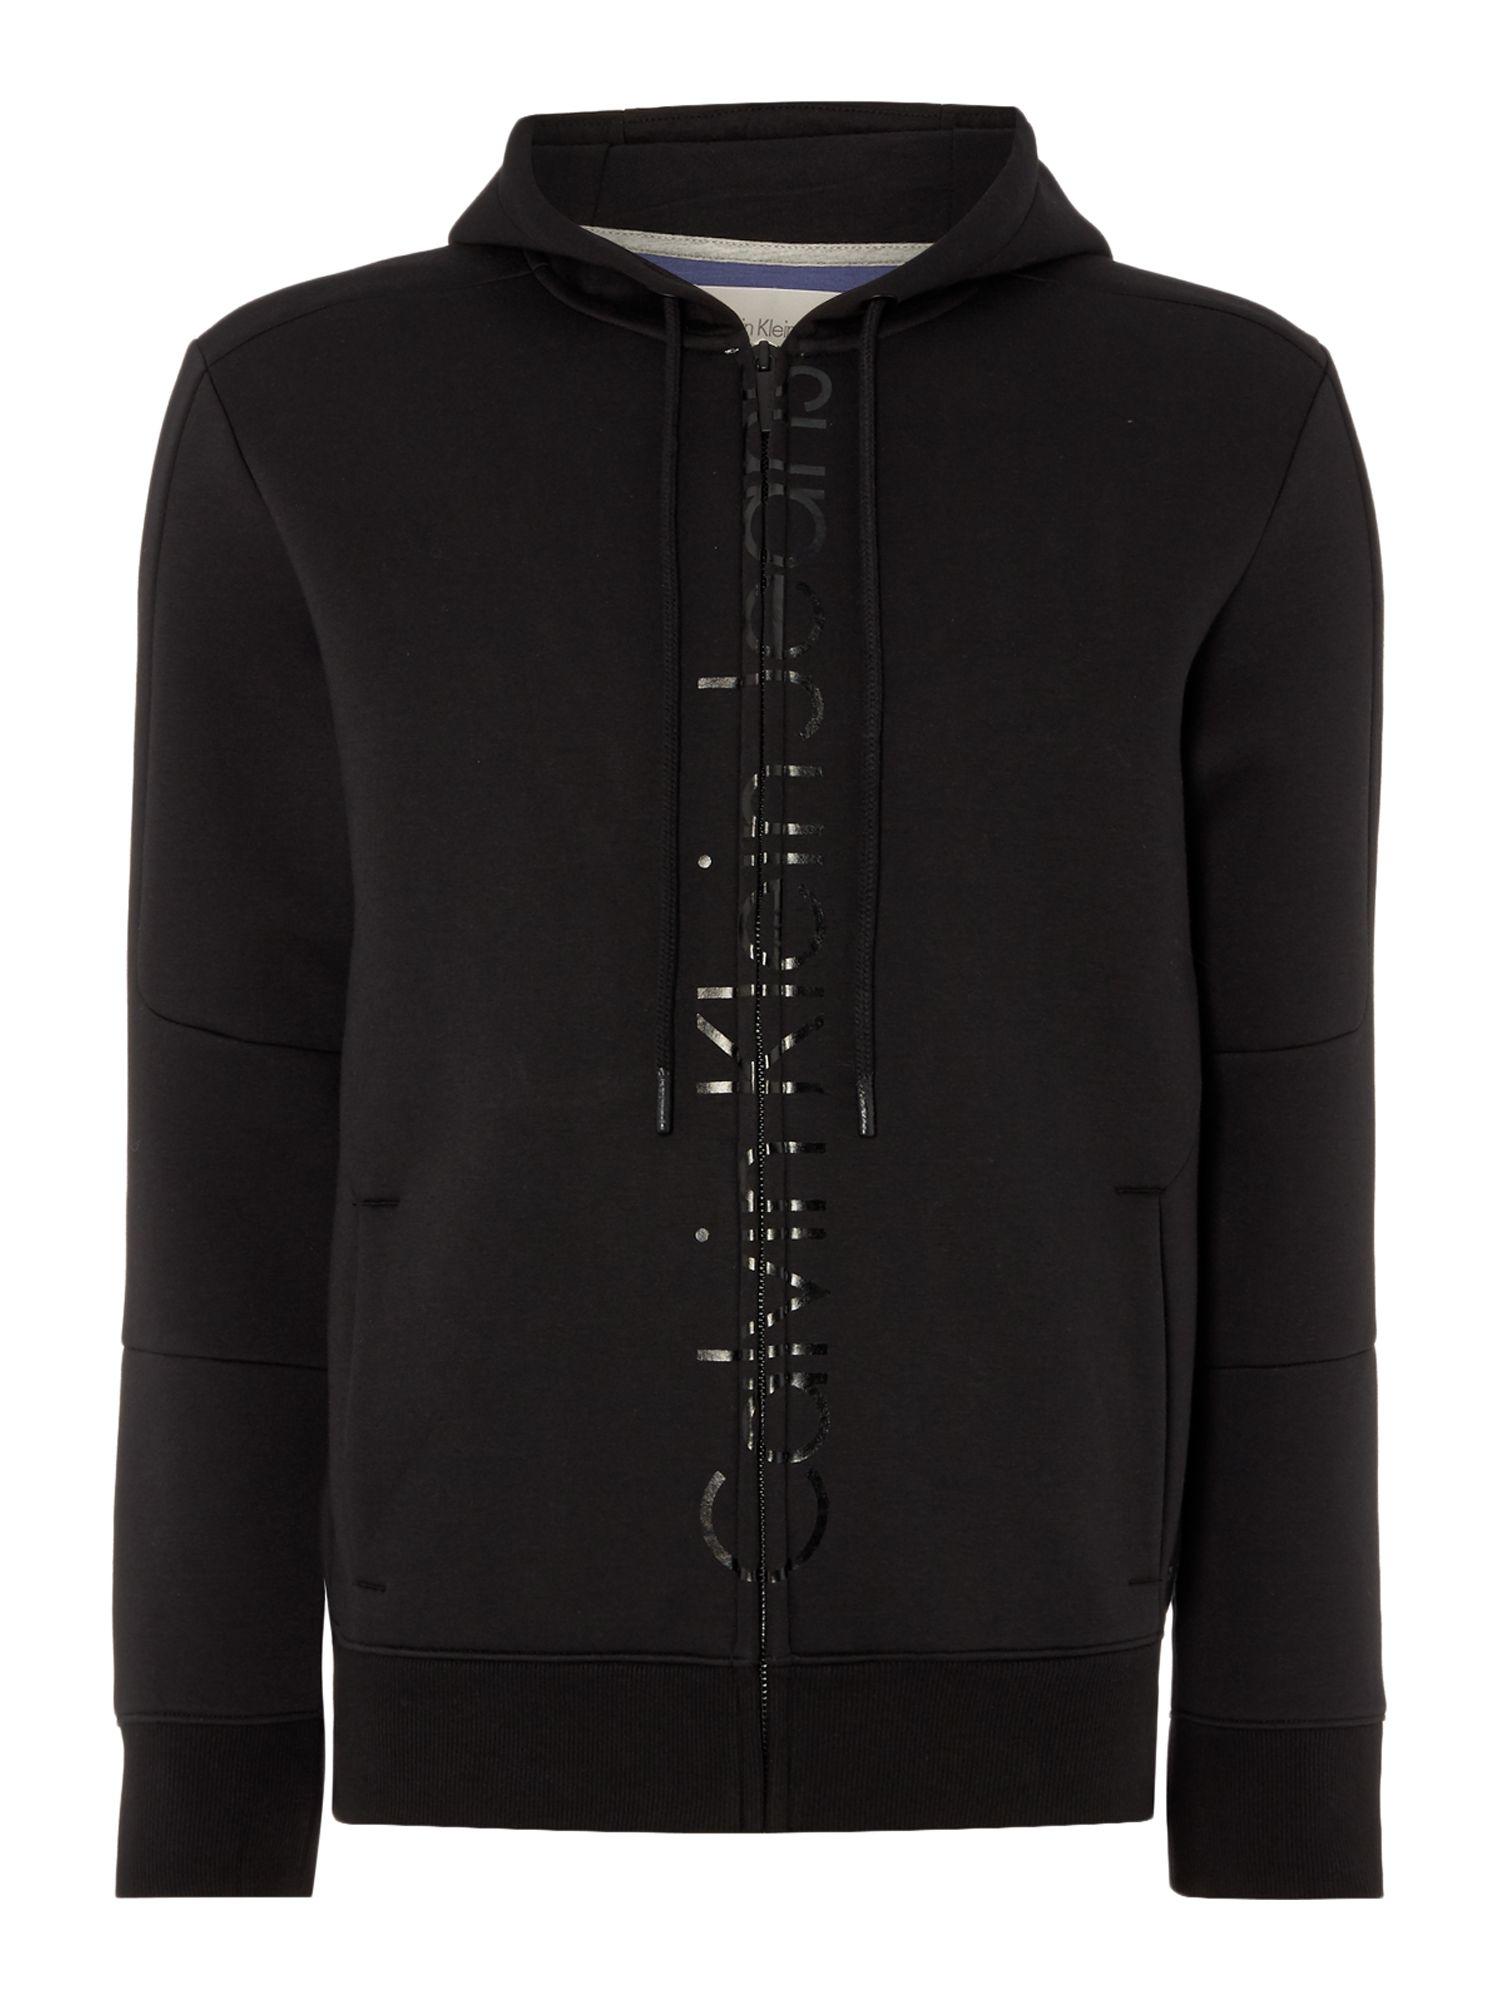 lyst calvin klein jepson long sleeve zip through hoodie in black for men. Black Bedroom Furniture Sets. Home Design Ideas